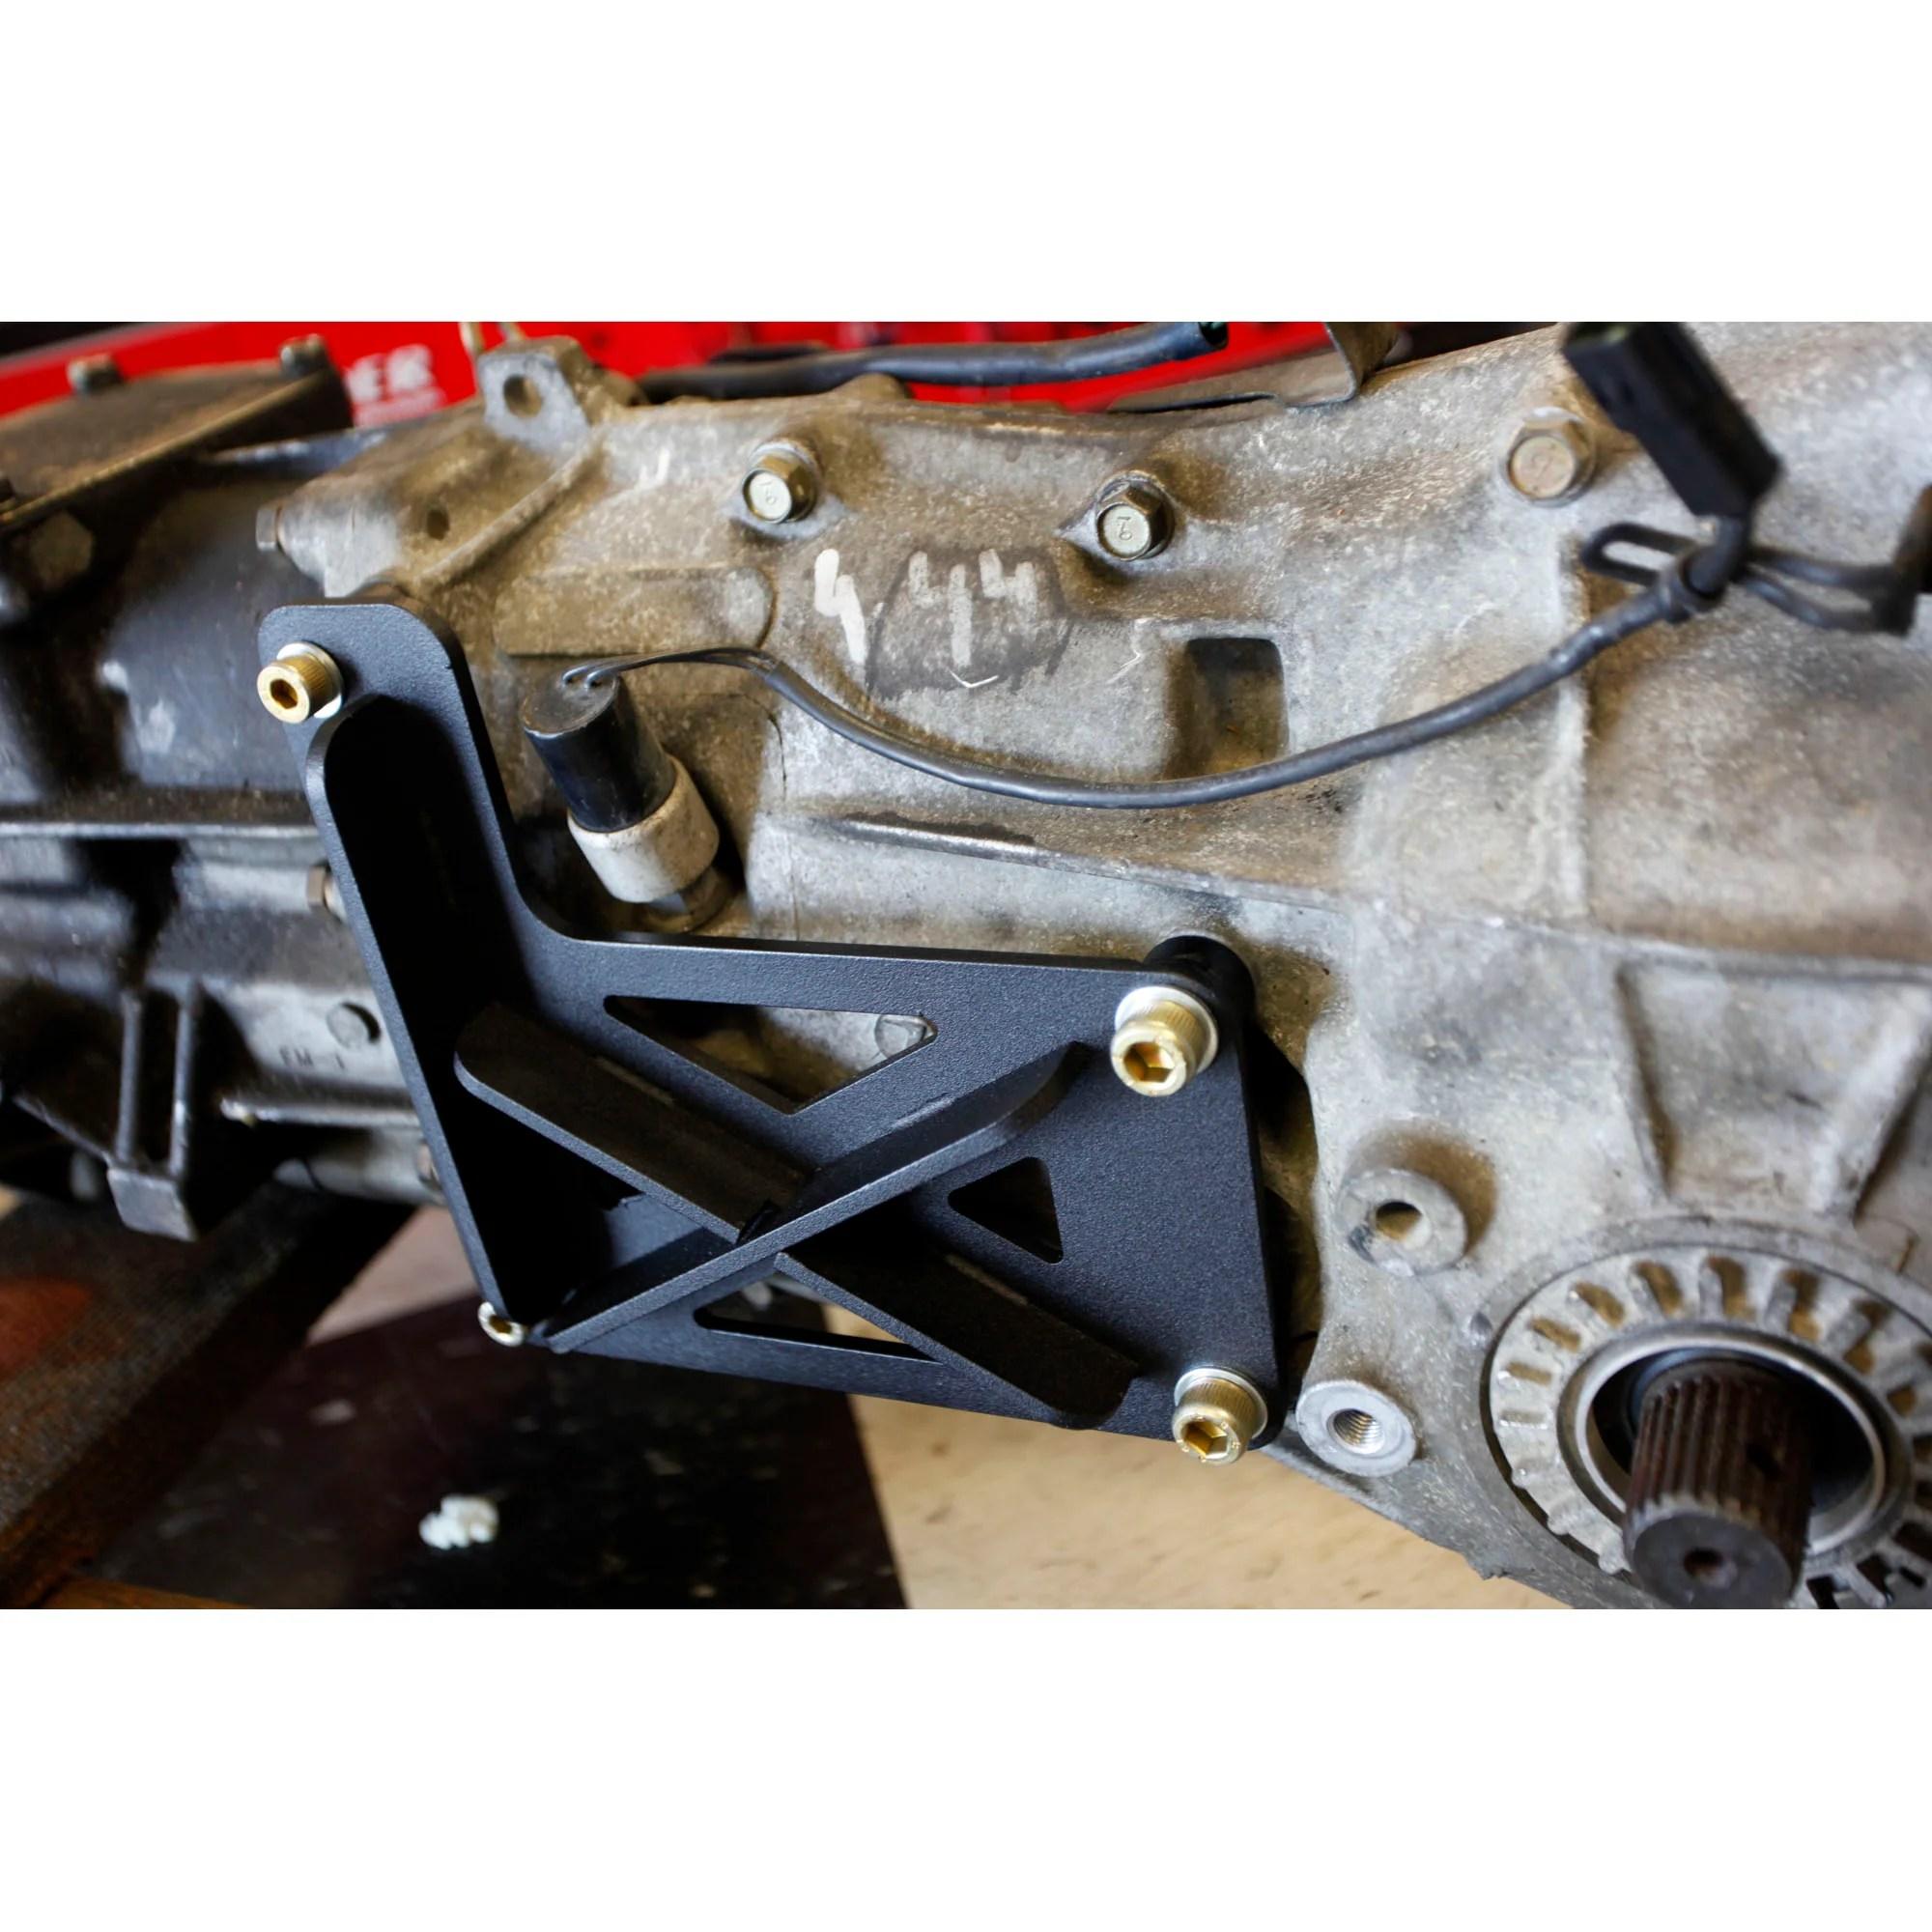 mach v transmission reinforcement brace kit subaru 5mt [ 2000 x 2000 Pixel ]